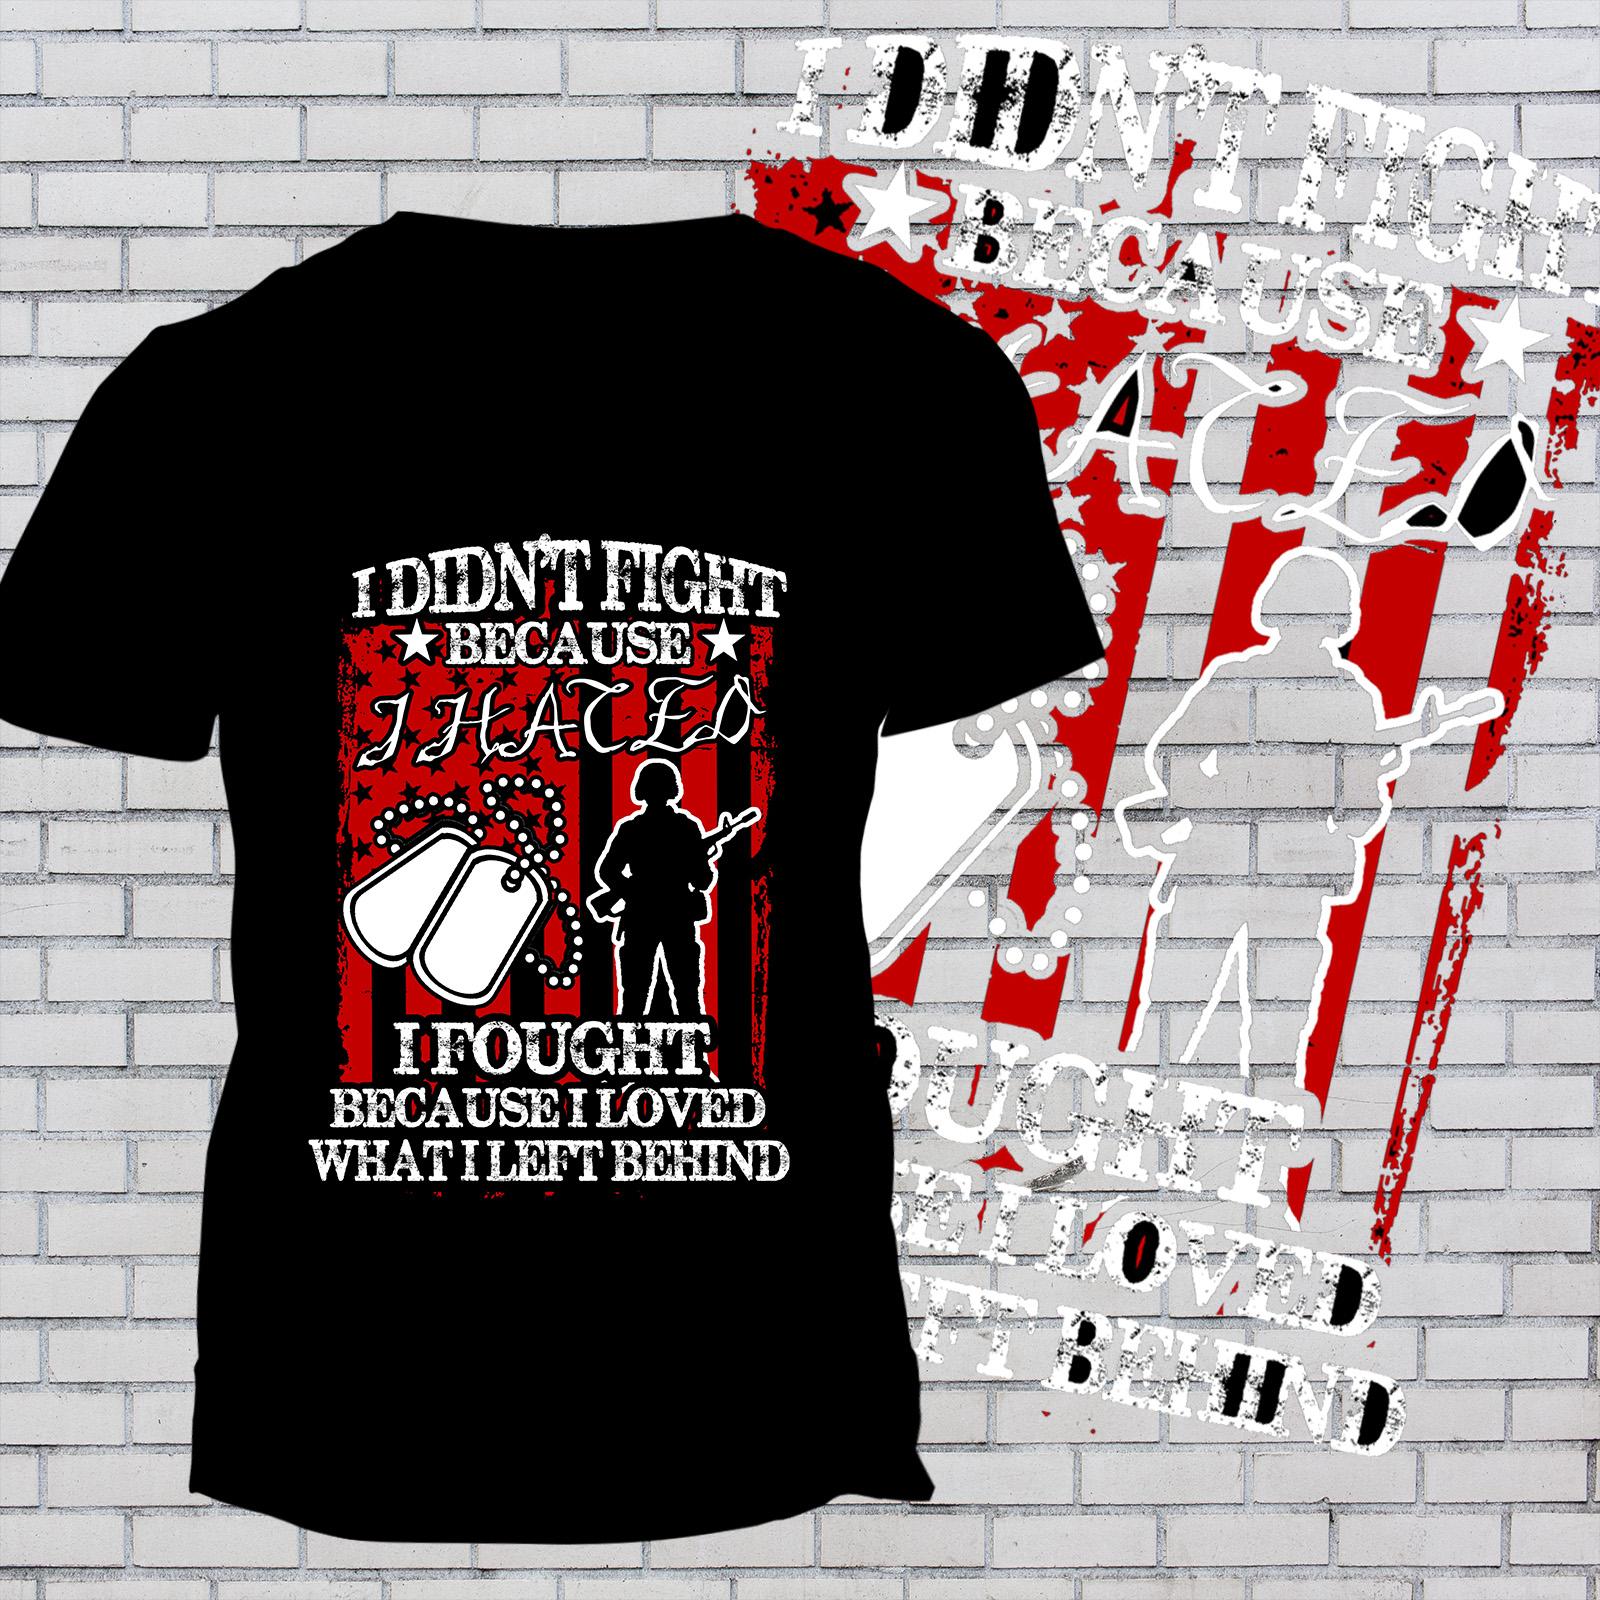 Get Custom Design T-shirt Unlimited Revision